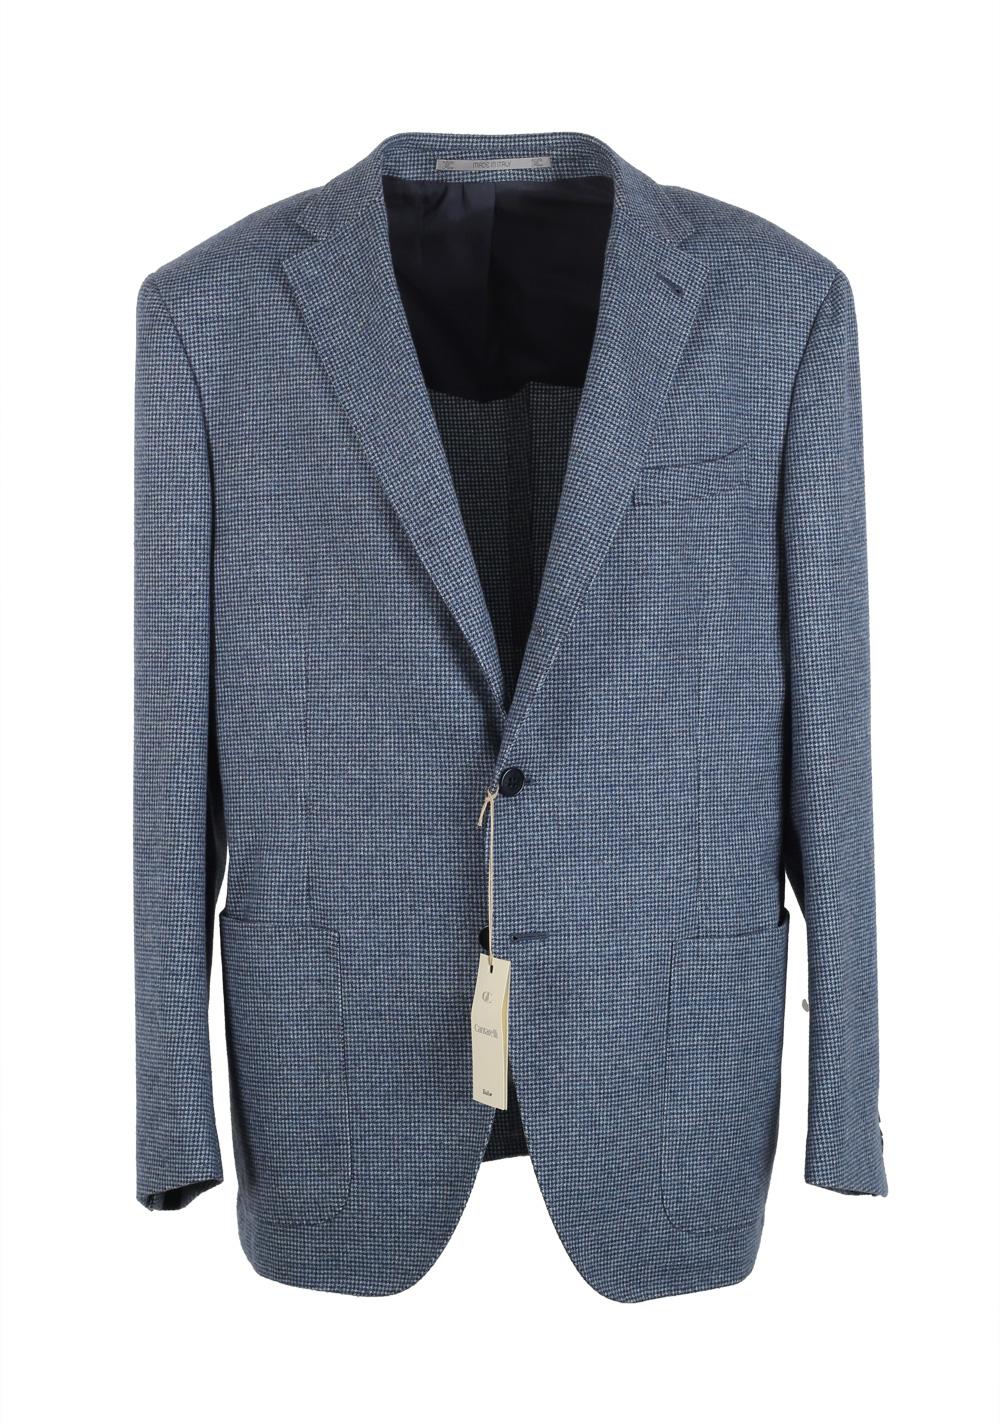 Cantarelli Sport Coat Size 54 / 44R U.S. Wool   Costume Limité